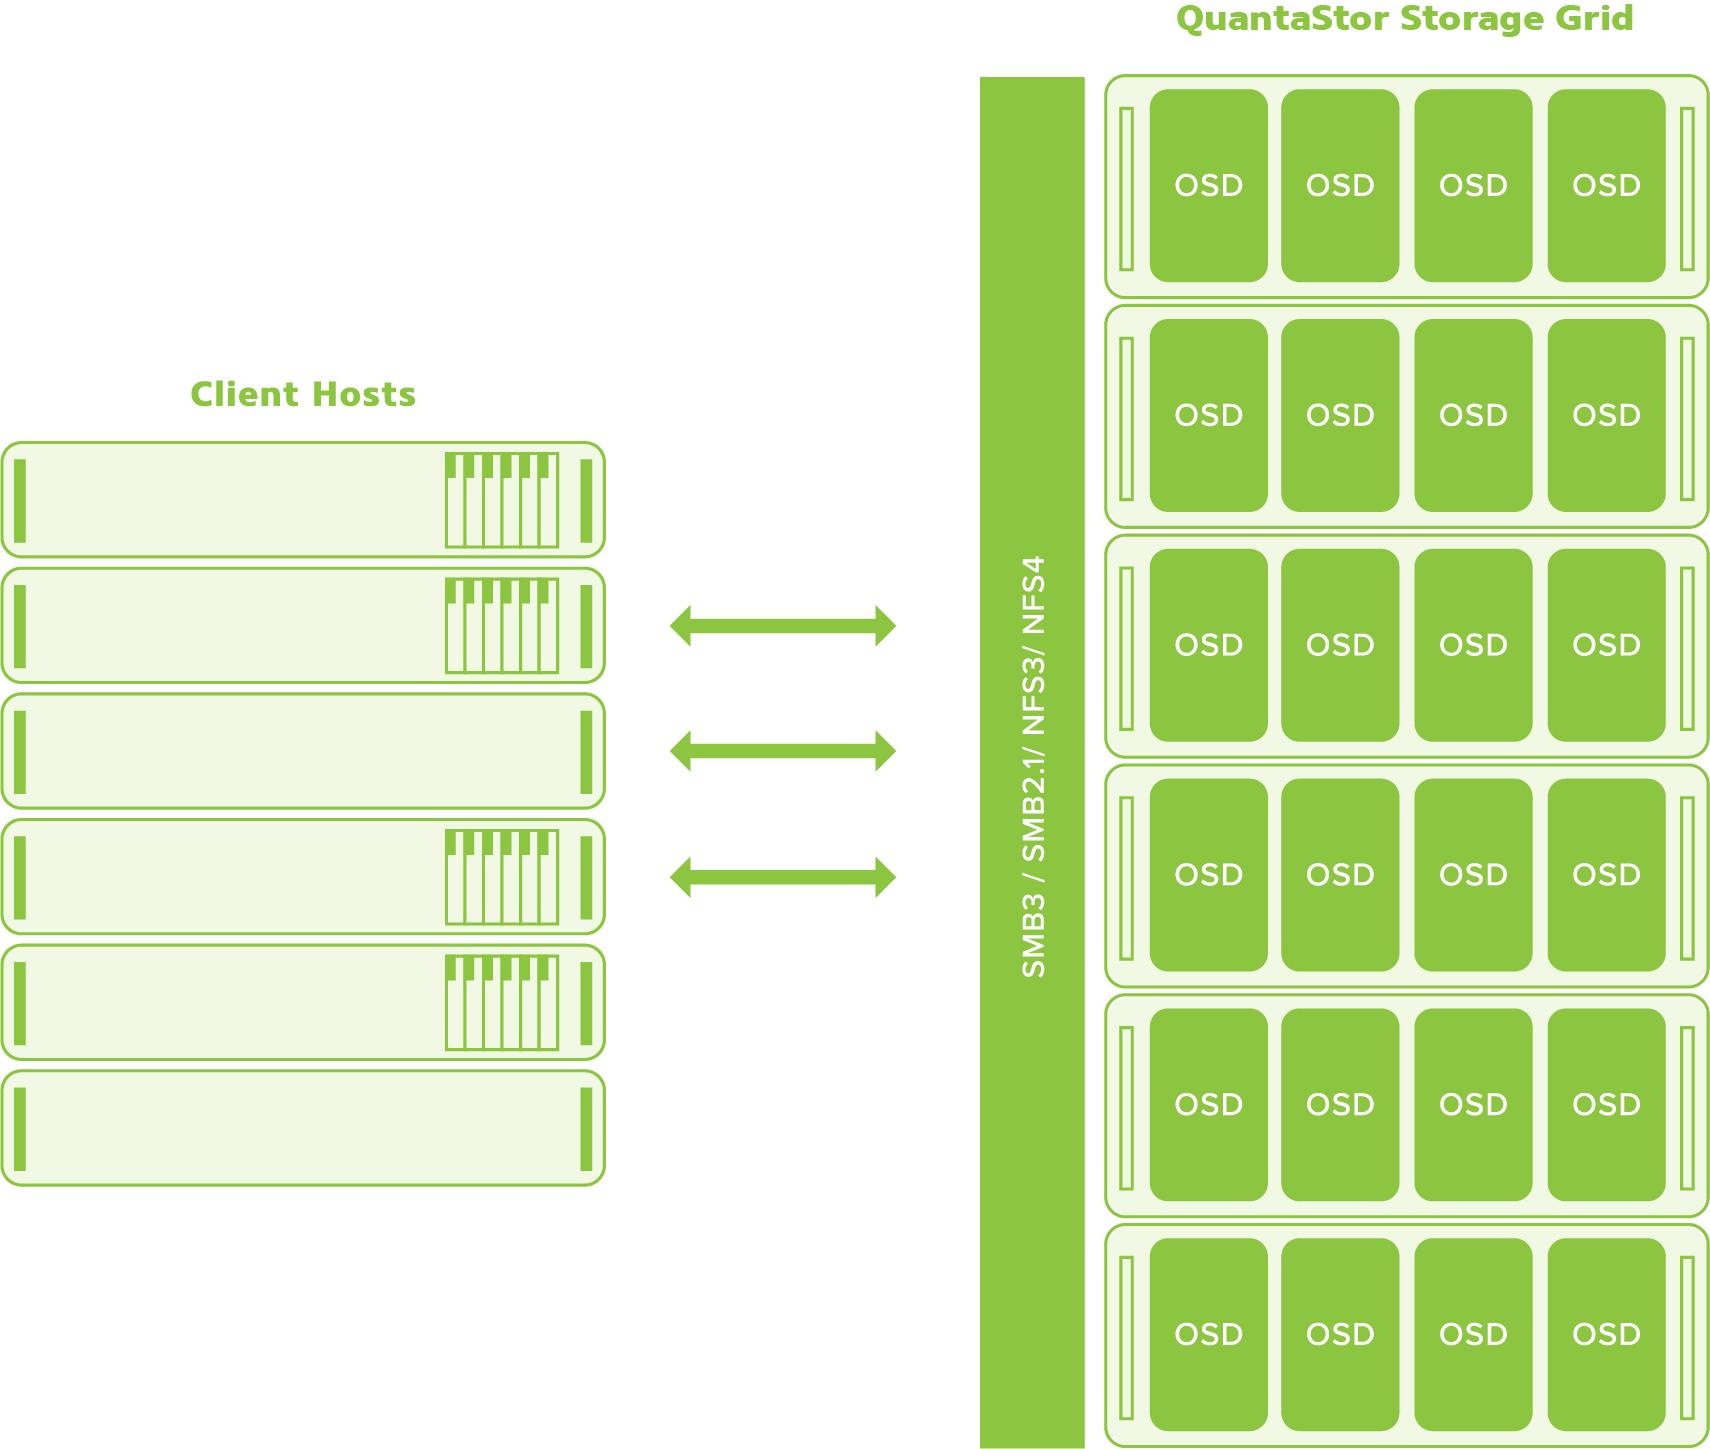 OSNEXUS_Block_Storage.png